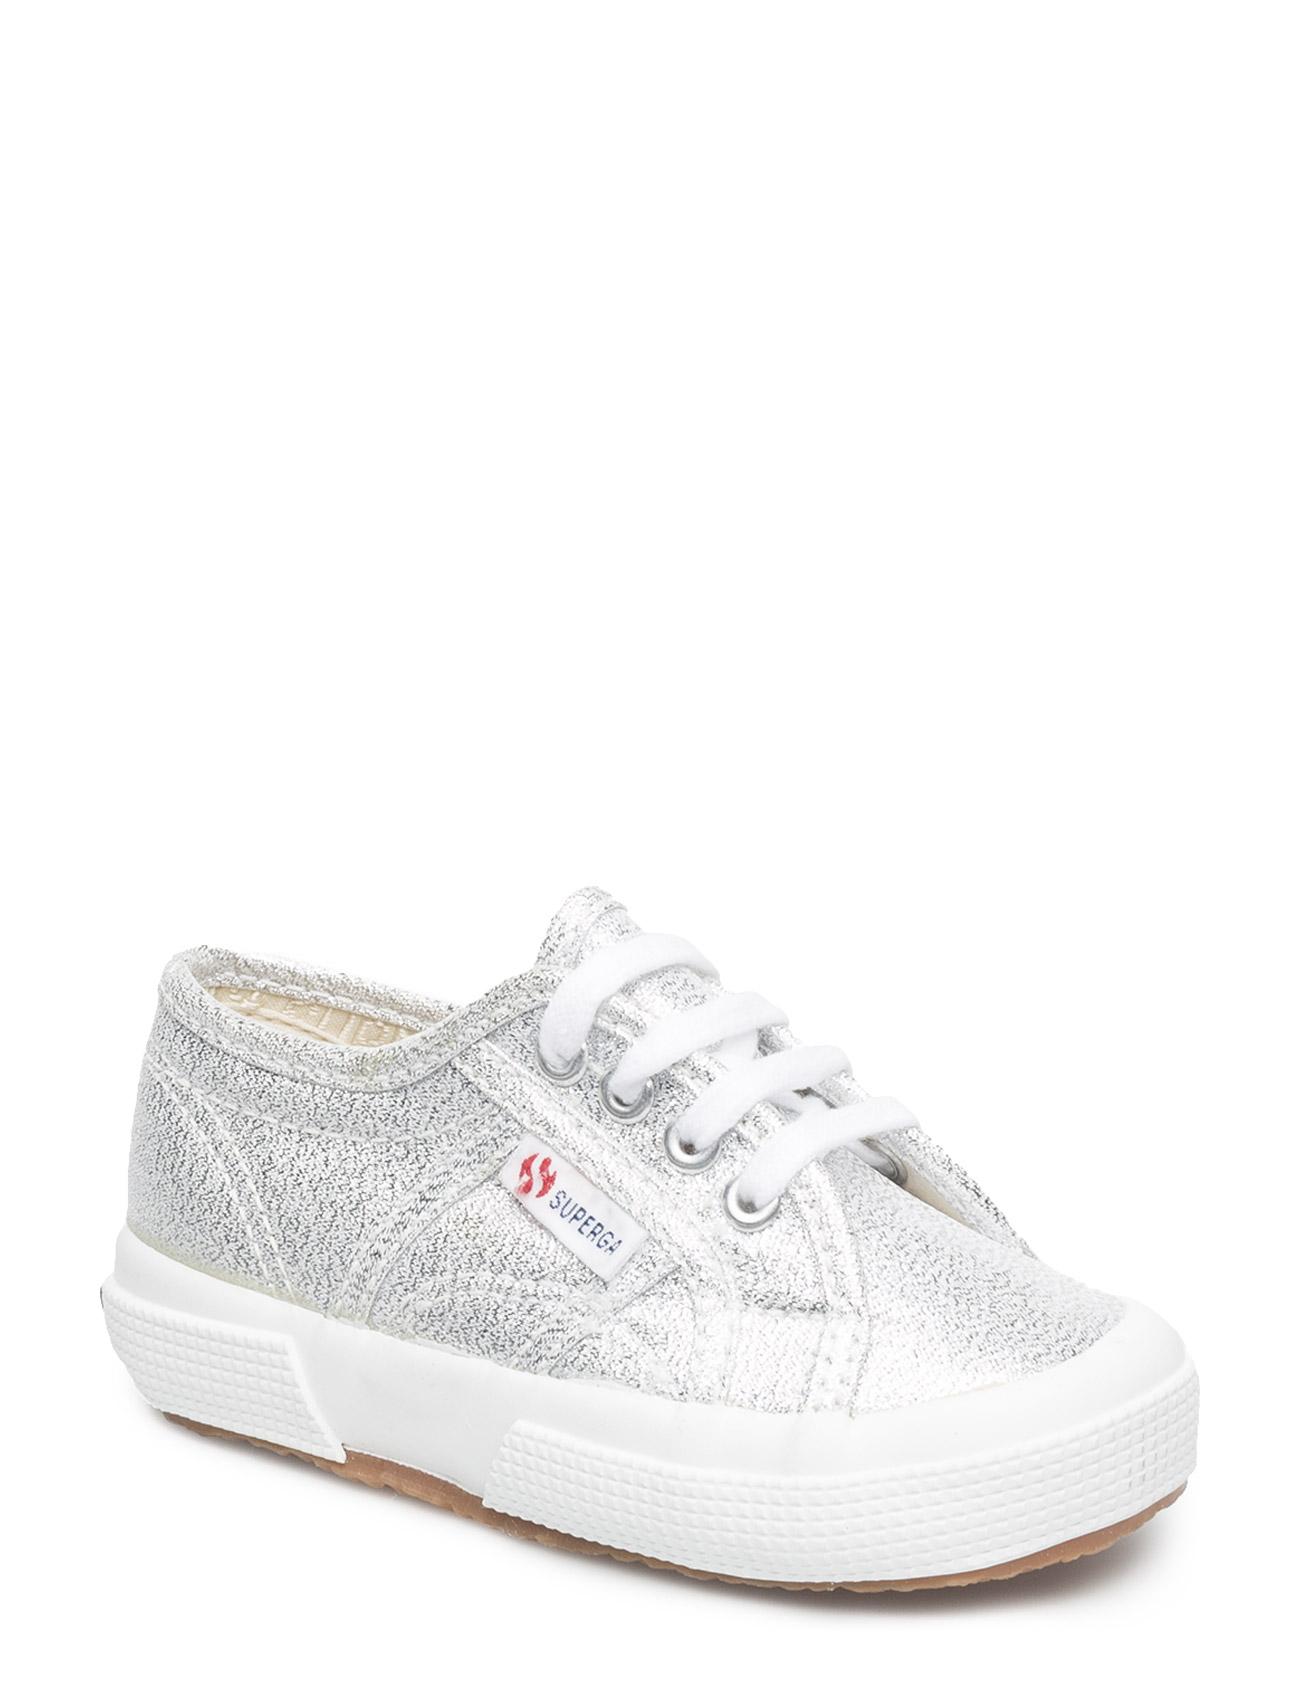 Superga 2750 Lameb Superga Sko & Sneakers til Børn i Sølv